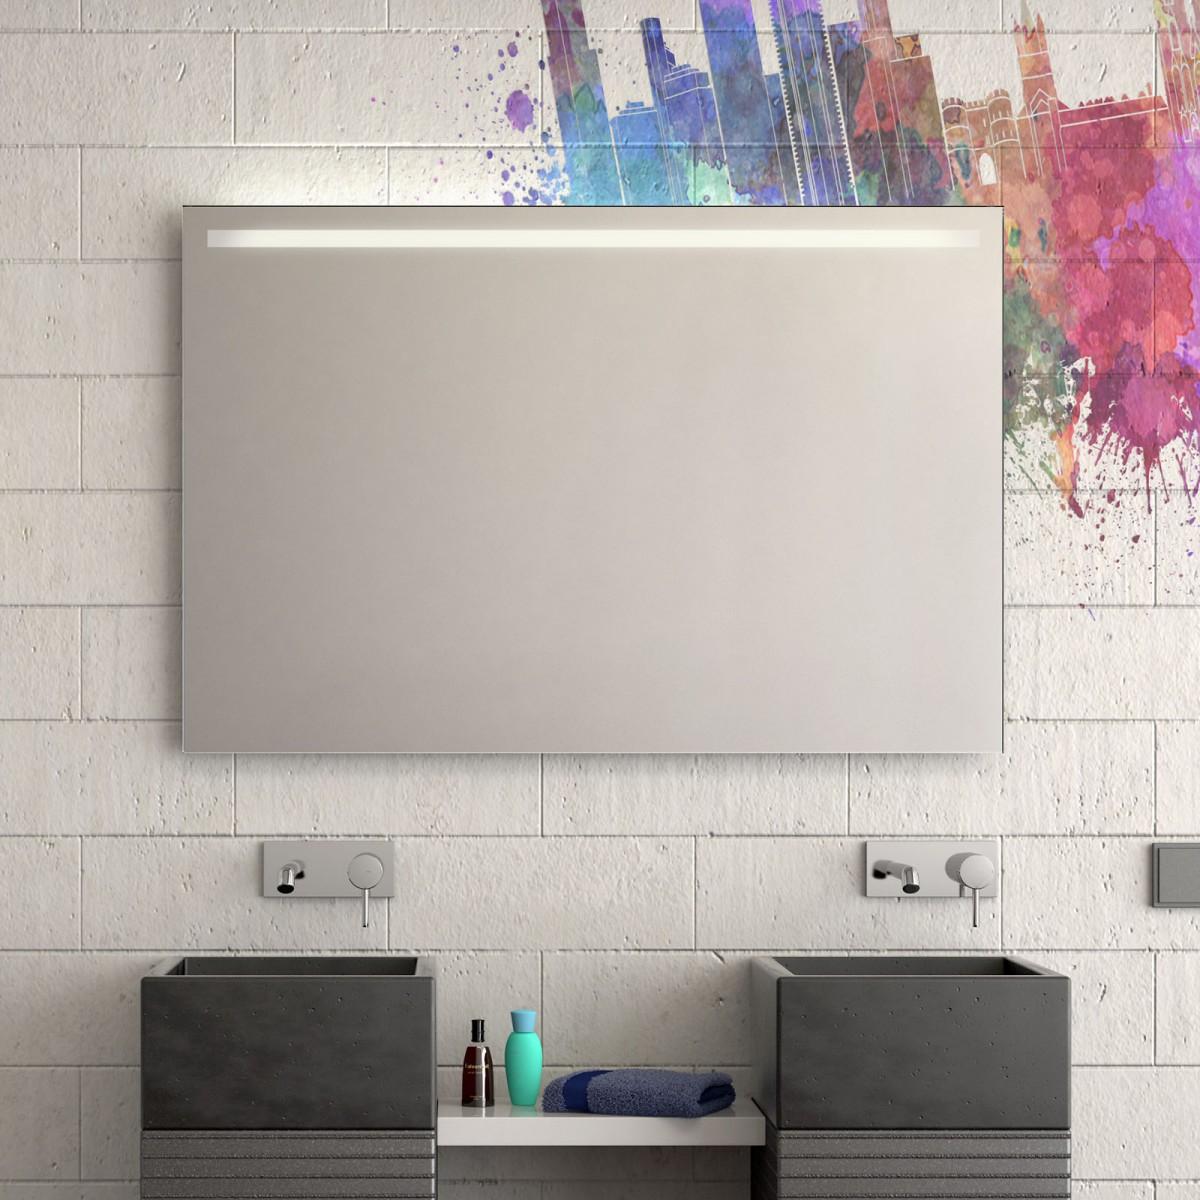 beleuchteter badspiegel weron 300871181. Black Bedroom Furniture Sets. Home Design Ideas